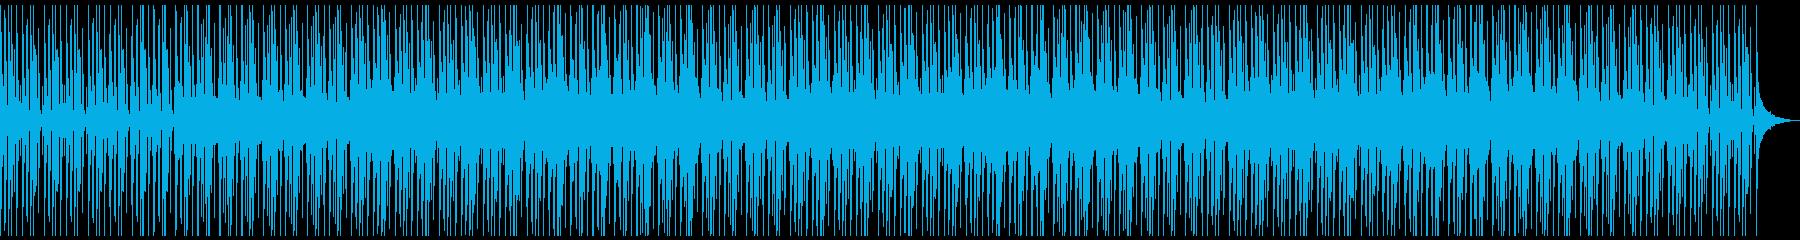 528Hz日常のストレス解放の瞑想曲2の再生済みの波形